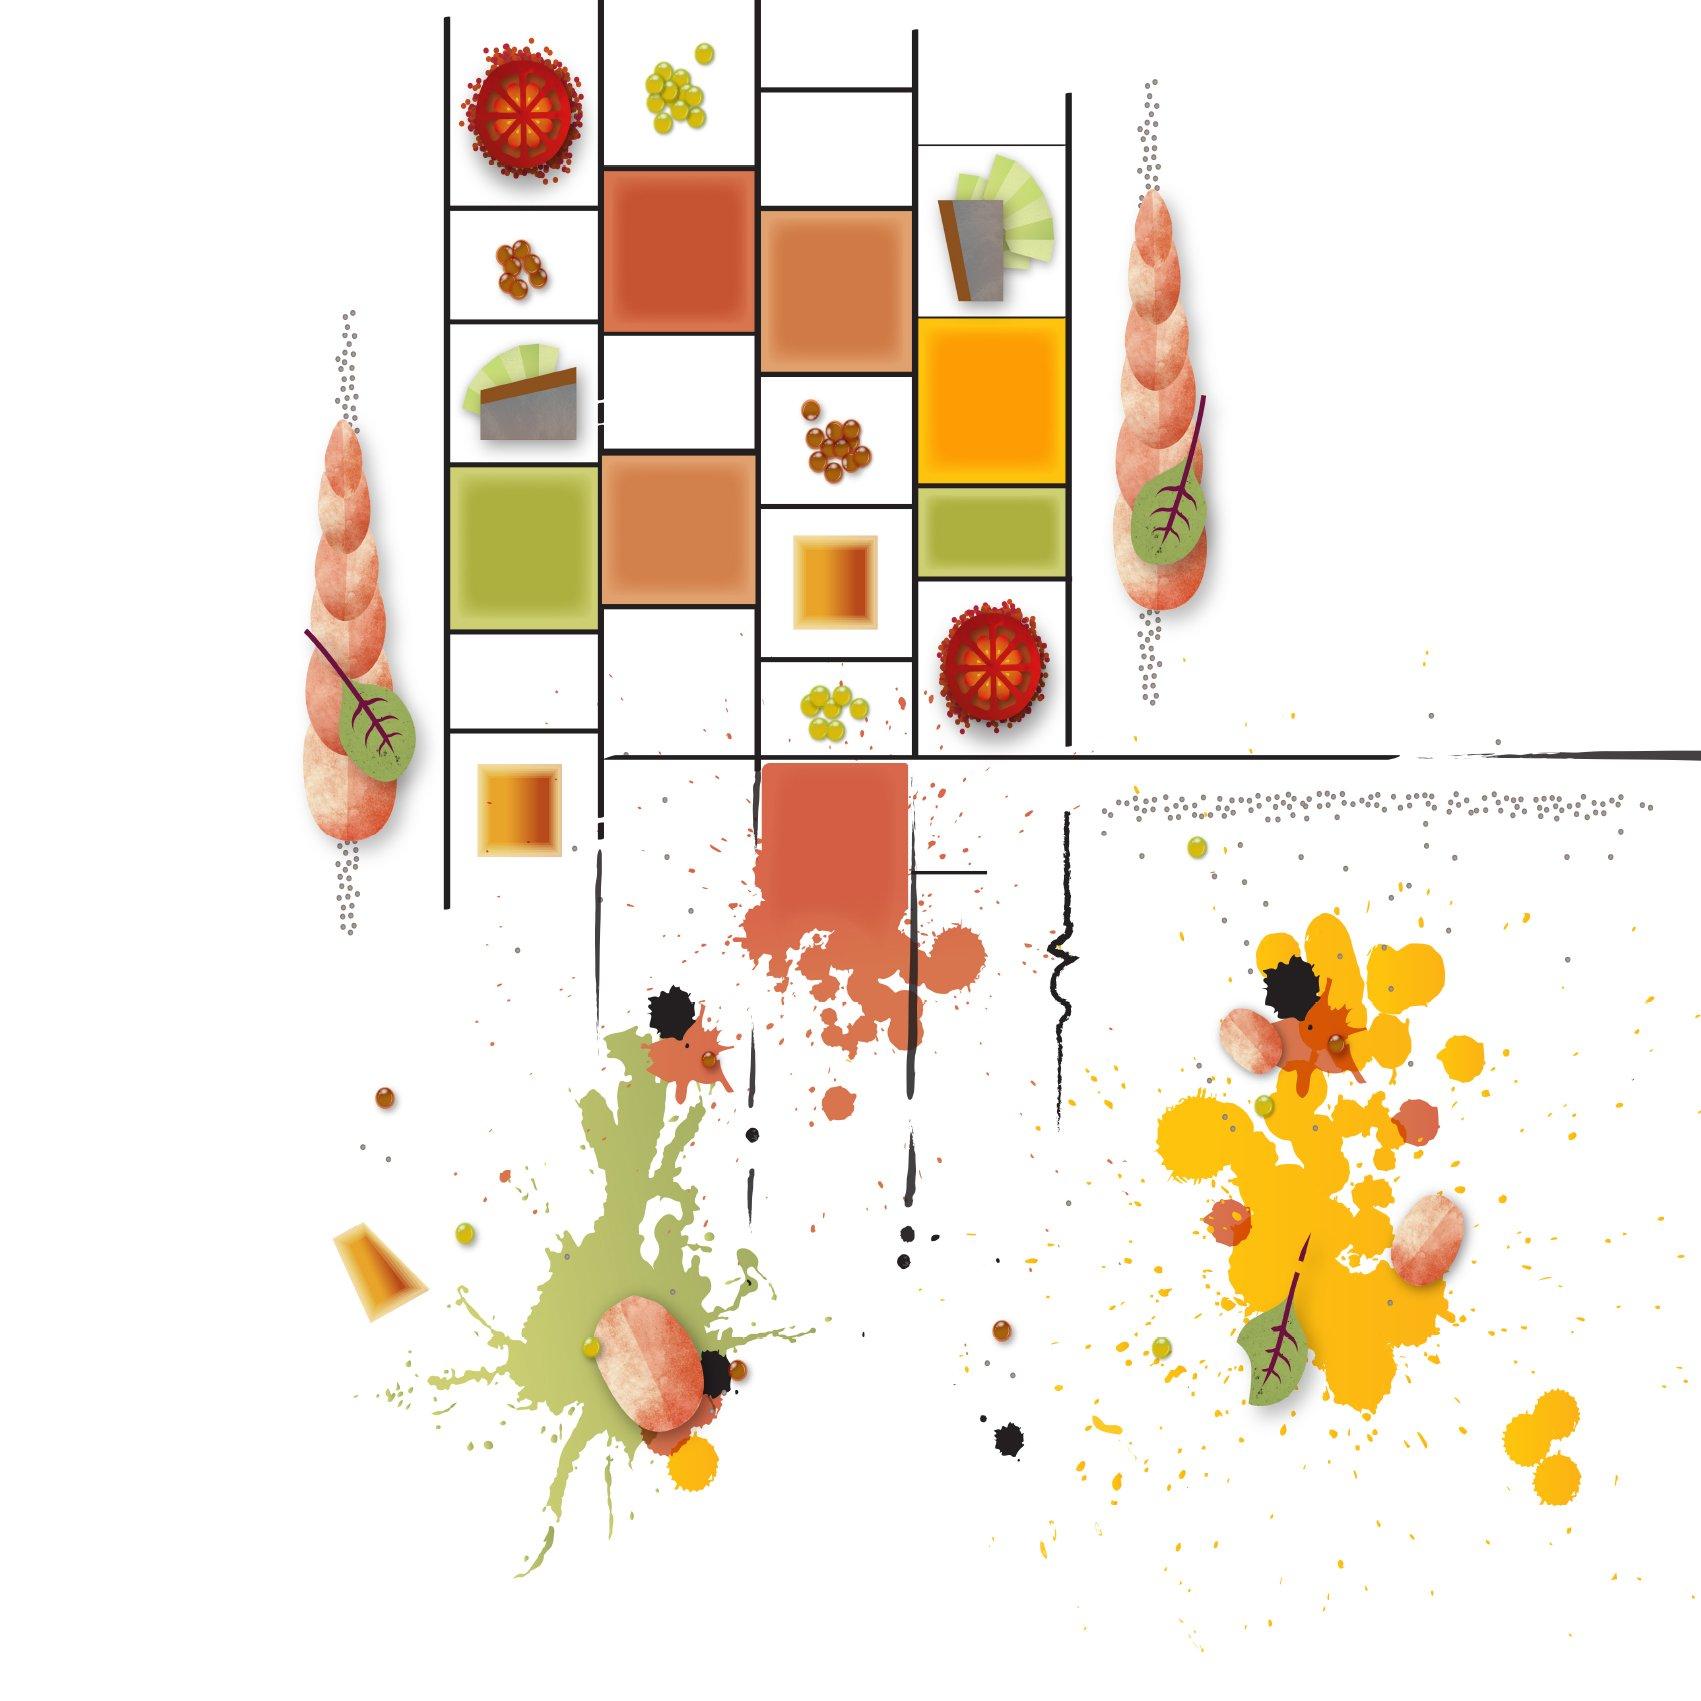 Sublime food design ricette in cibografica 7